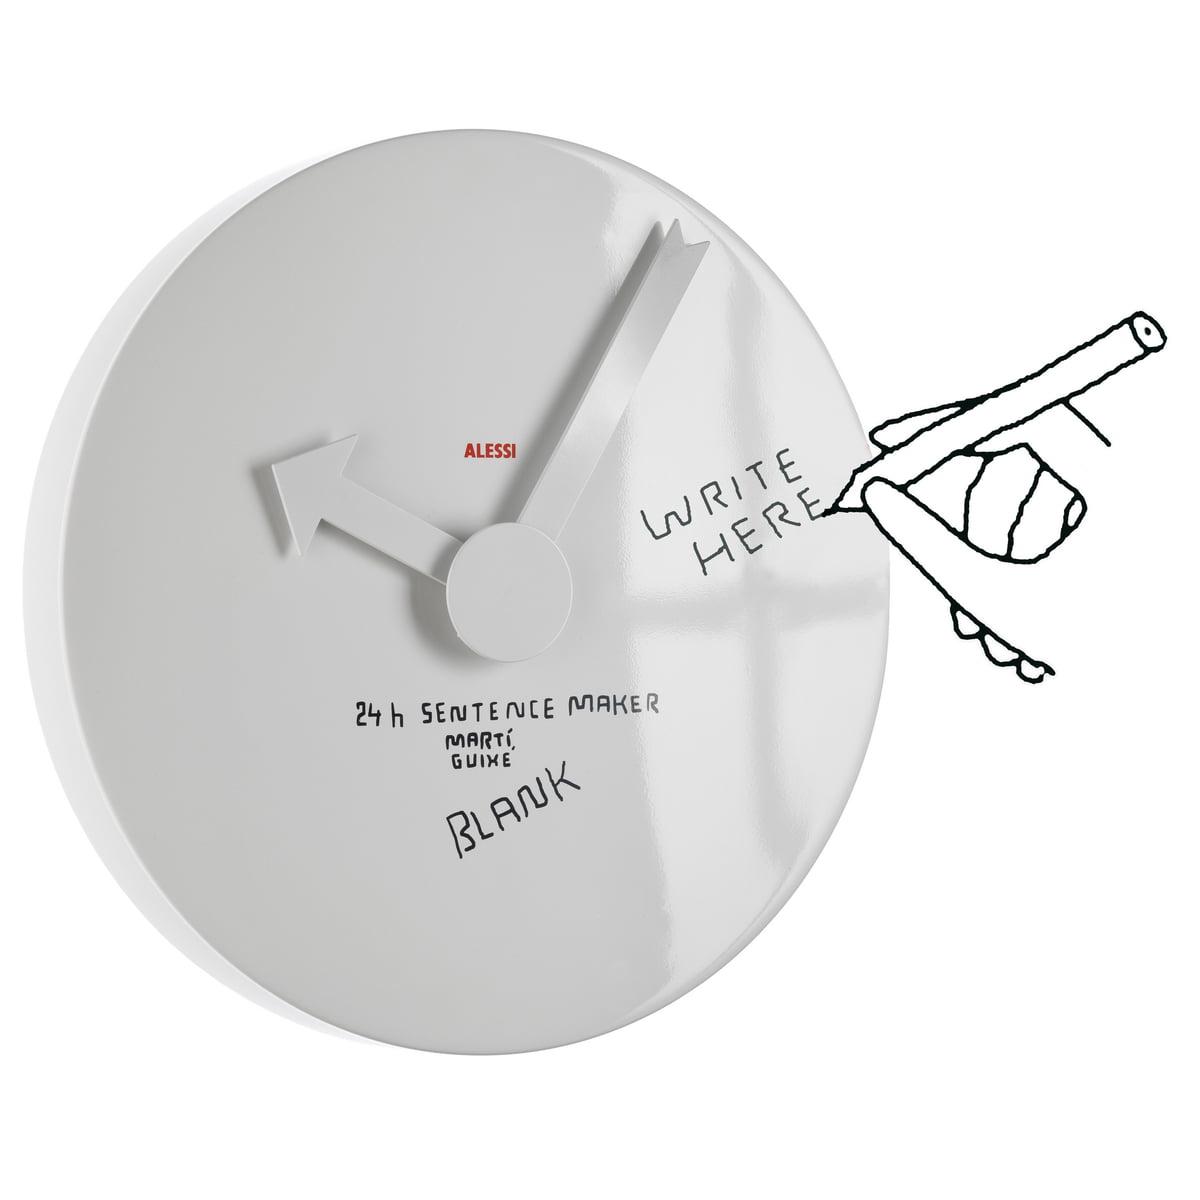 Blank wall clock anwendung